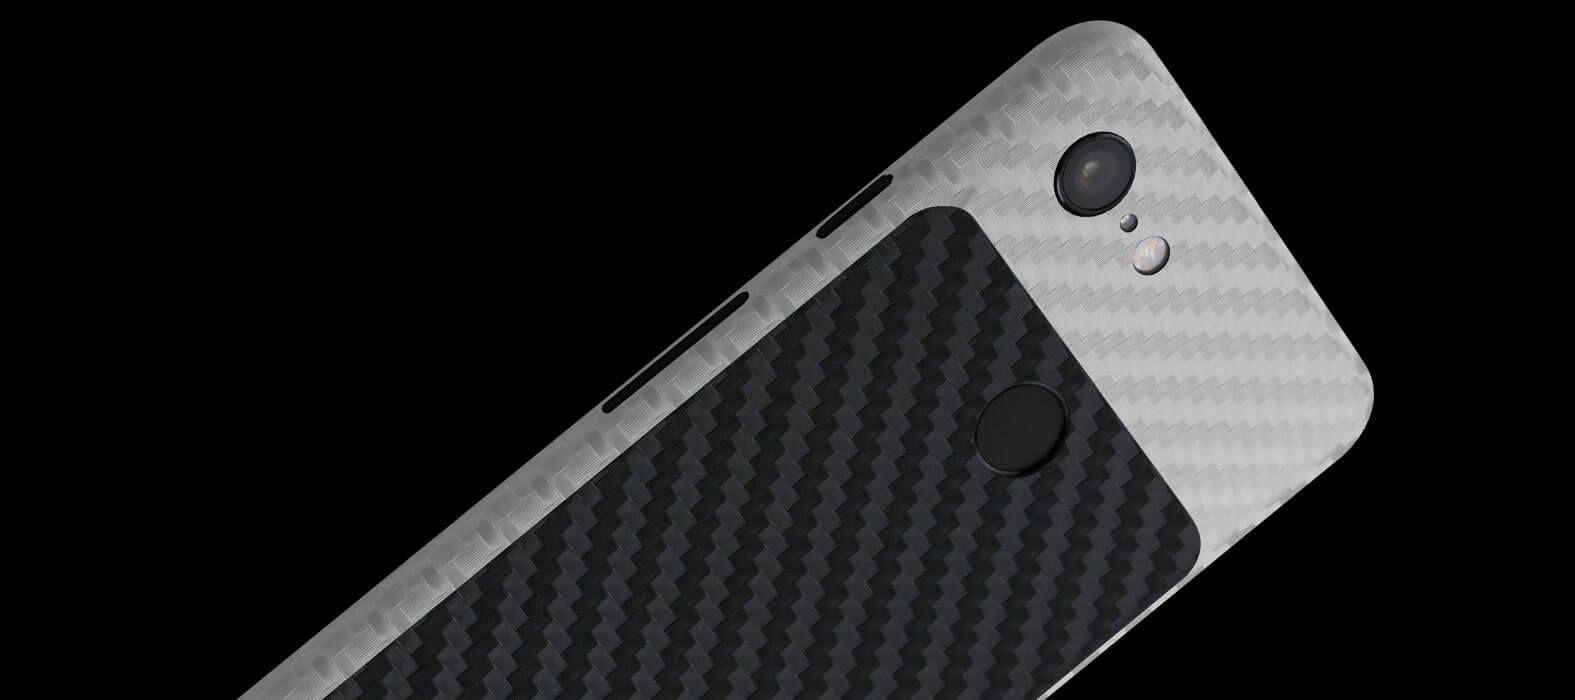 Pixel-3-XL_White-With-Black-Carbon-Fiber_Skins